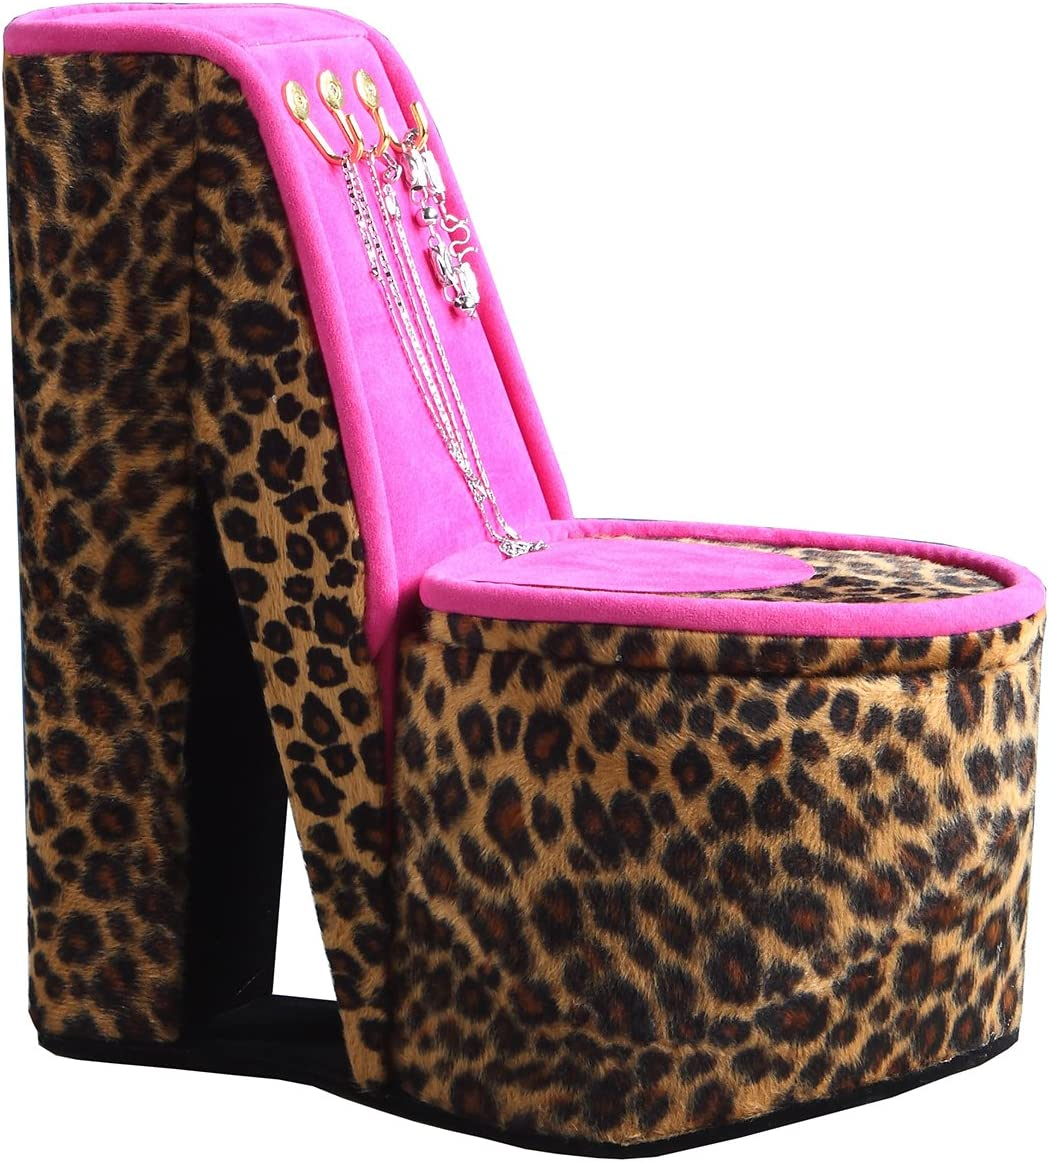 ORE International HBB1826 High Heel Shoe Display with Hooks Jewelry Box, Cheetah Print